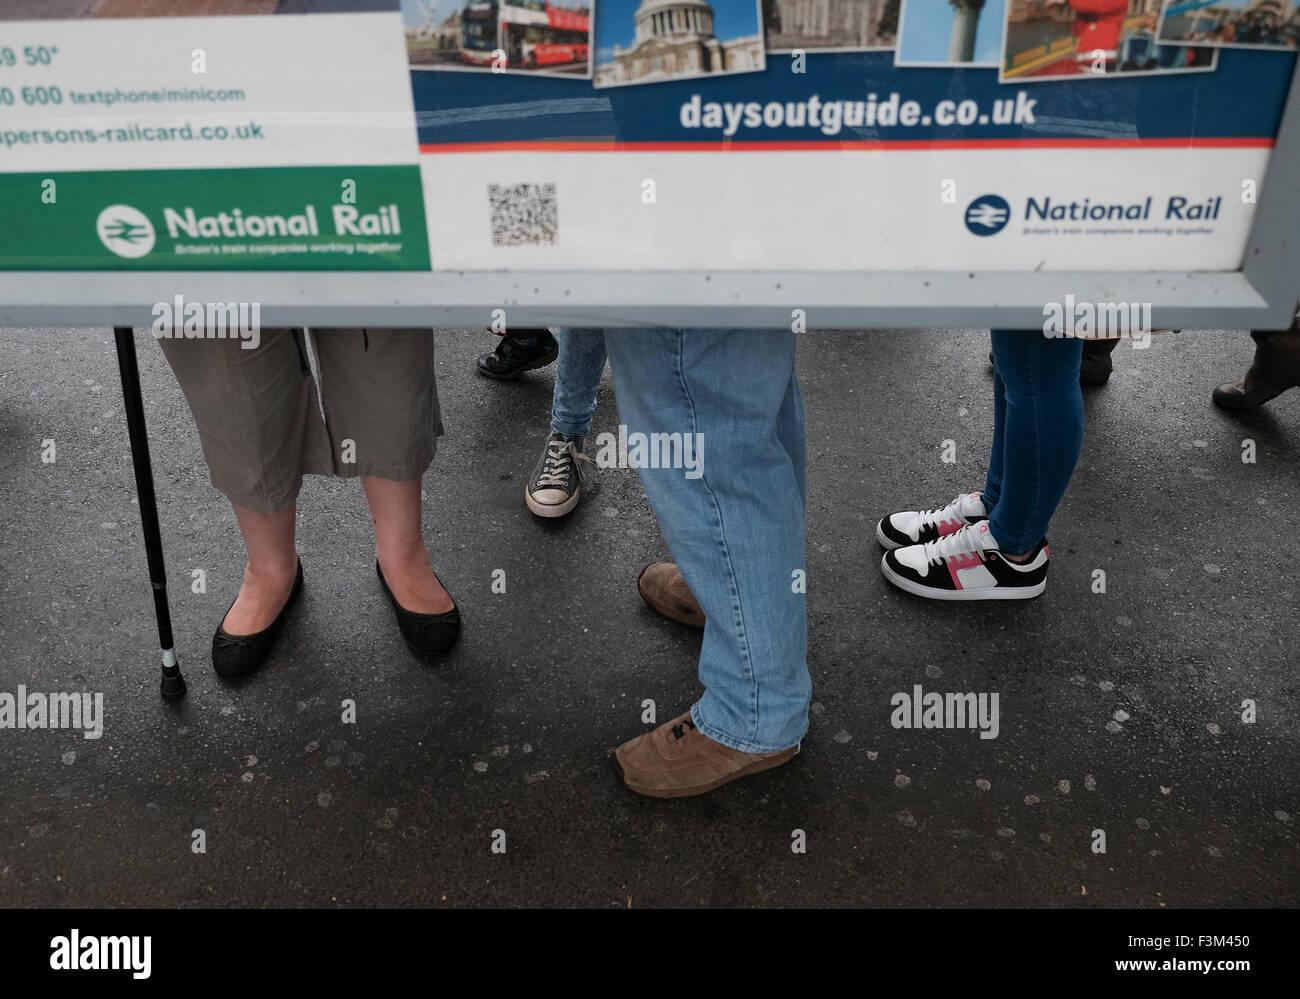 National rail people on train platform waiting - Stock Image